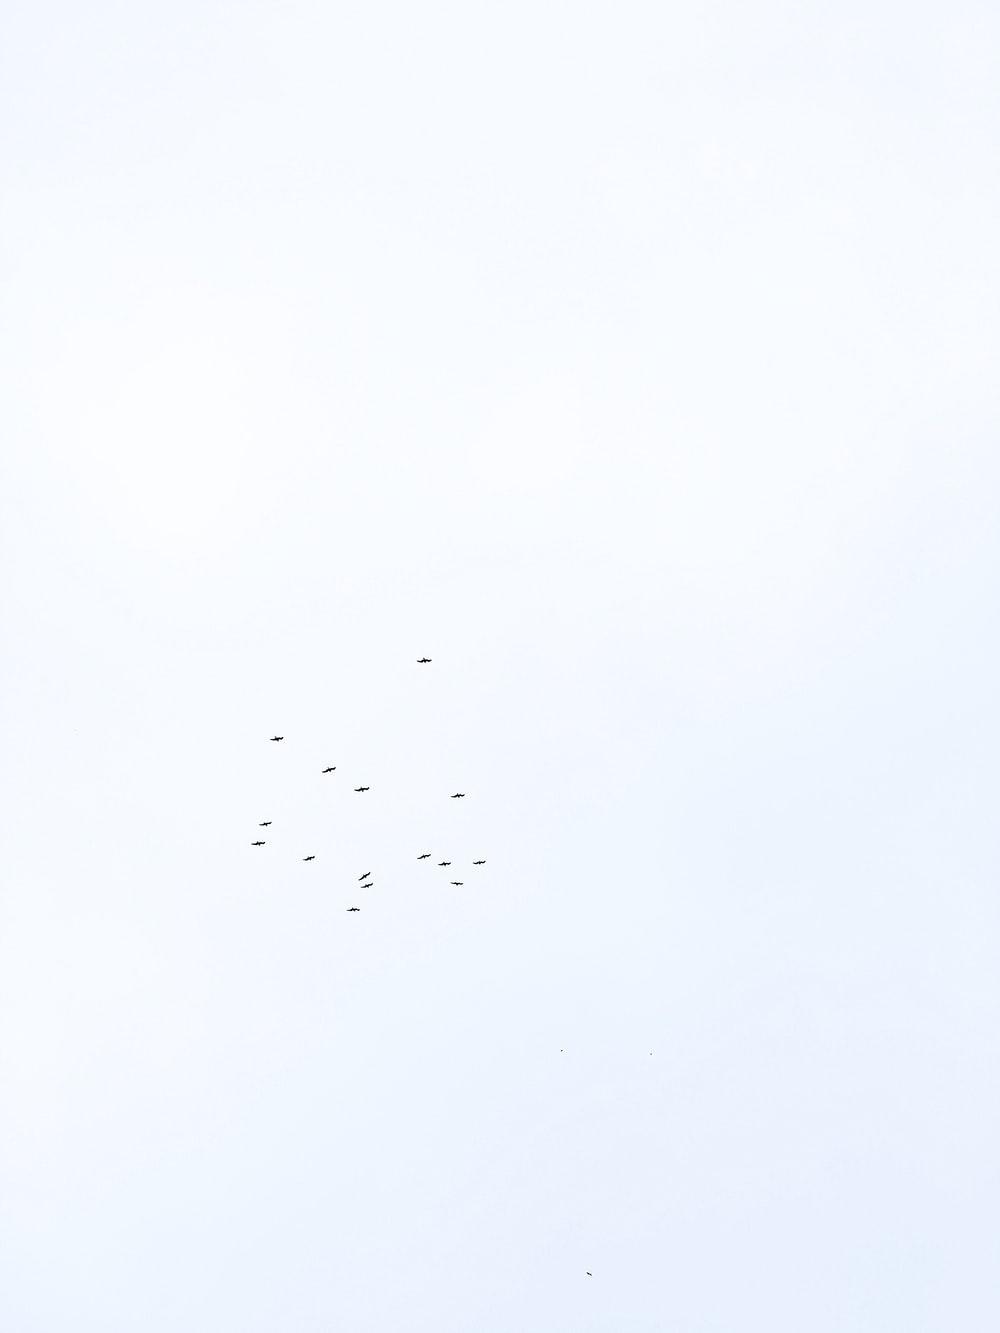 flying bird under clear skies